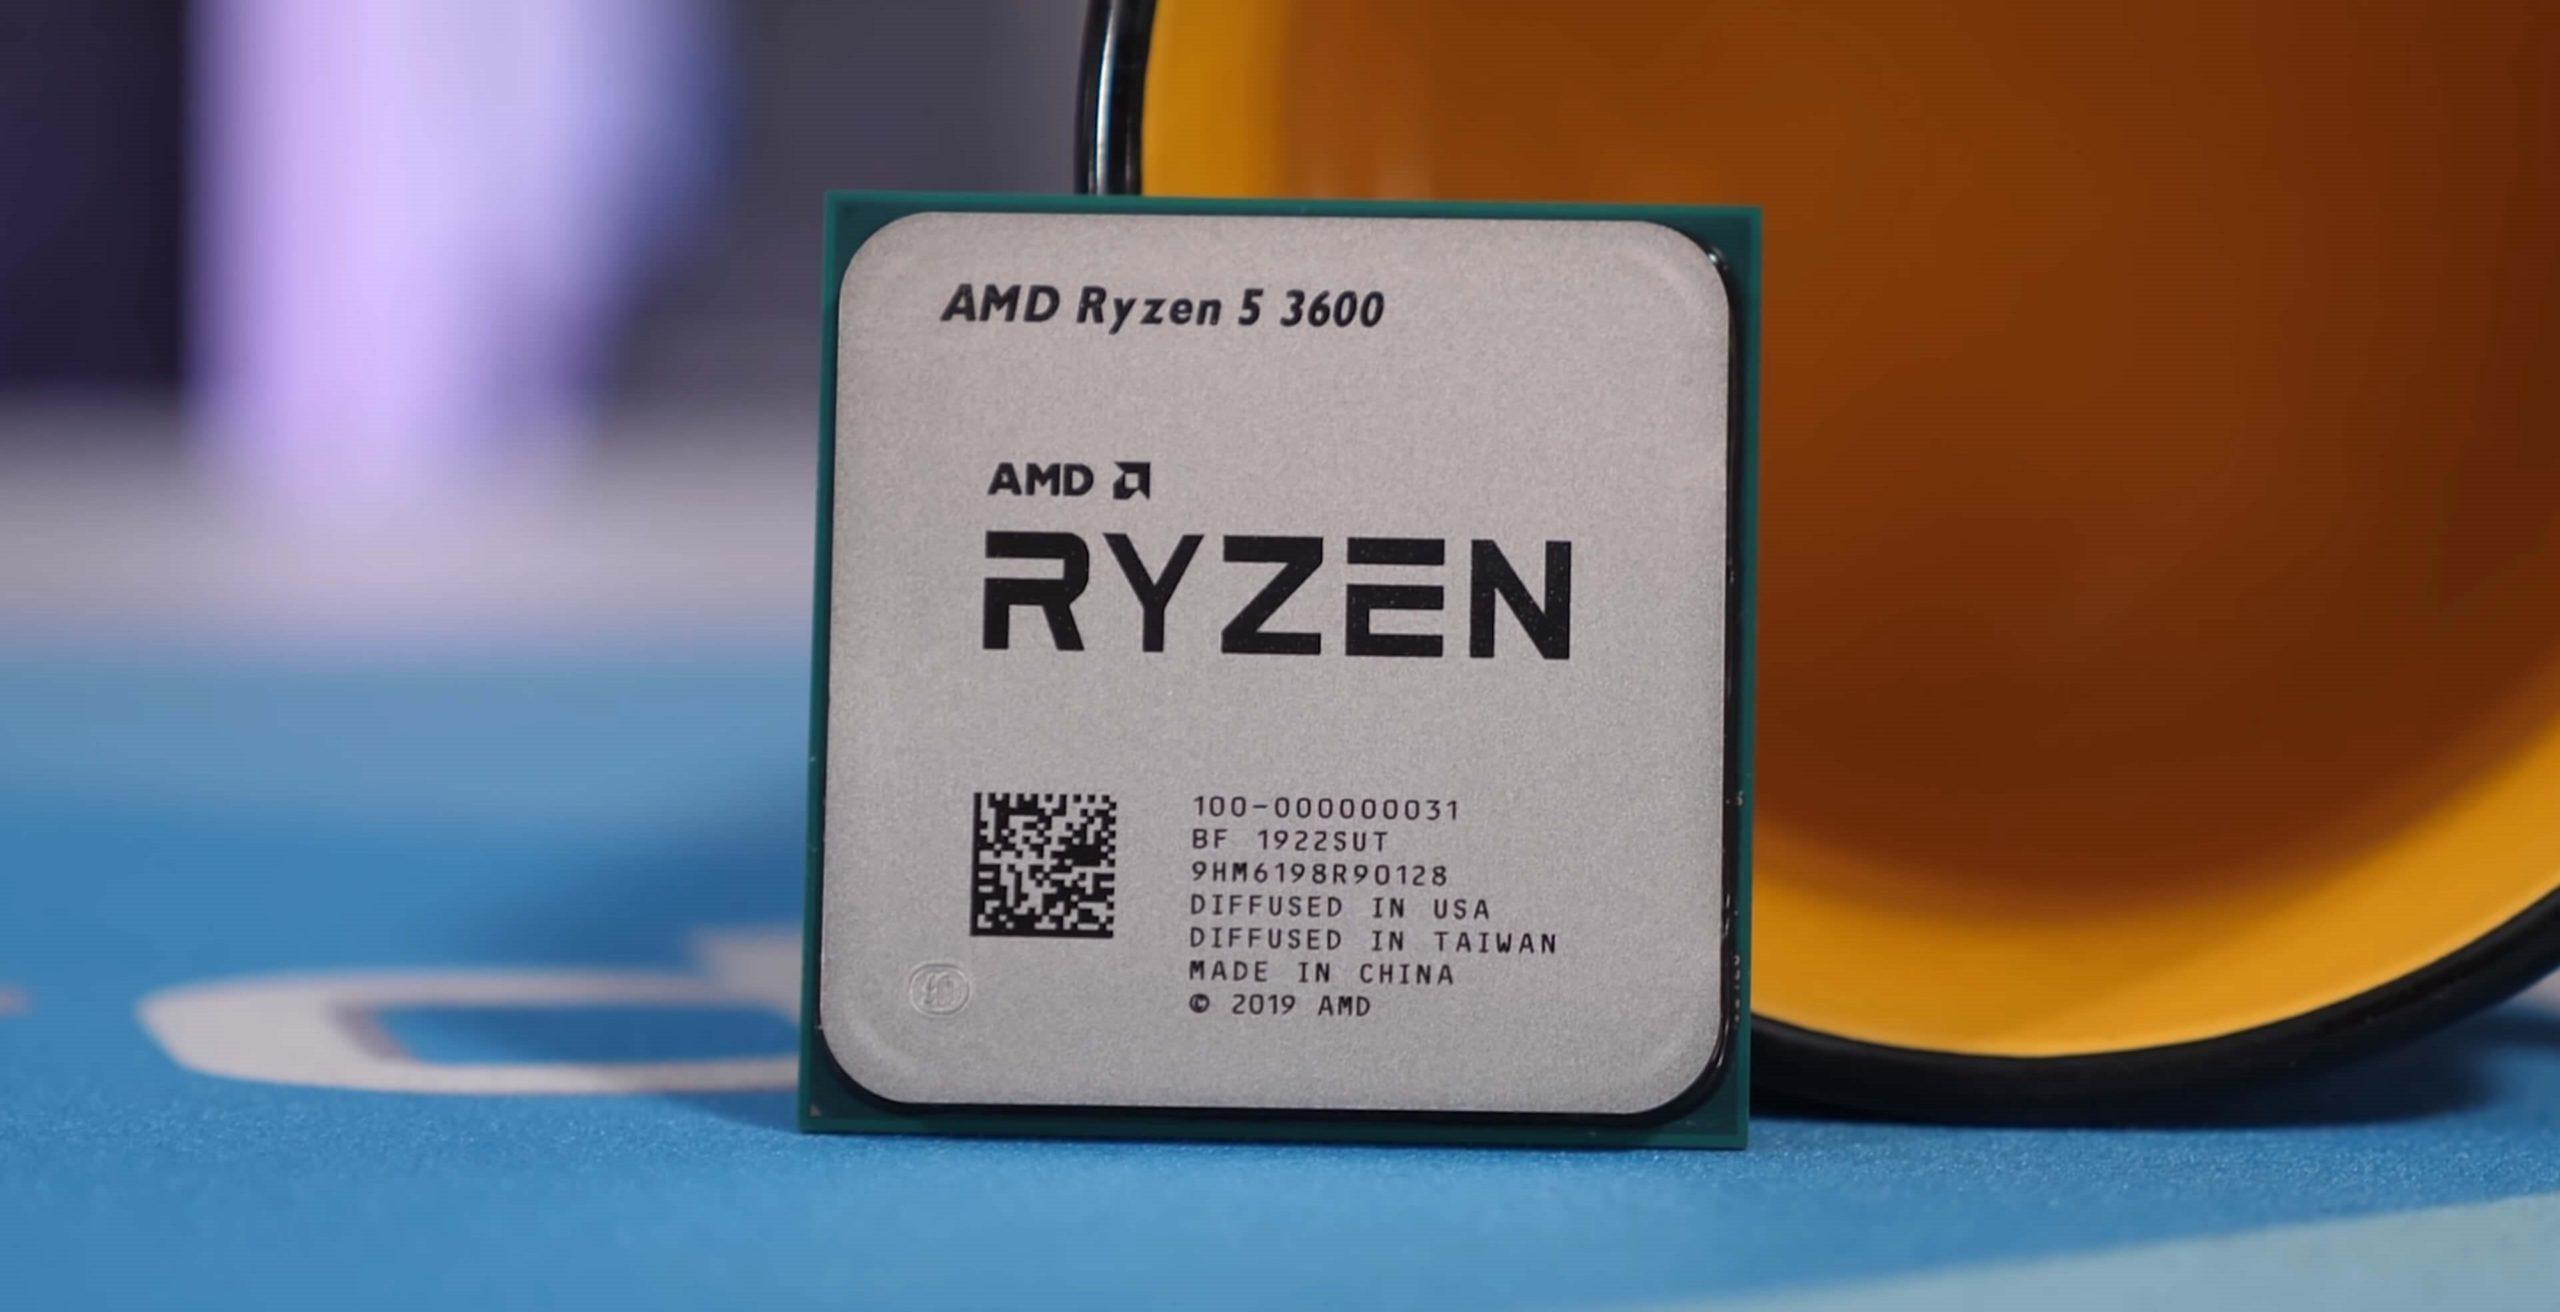 AMD Ryzen 5 3600: miglior processore gaming